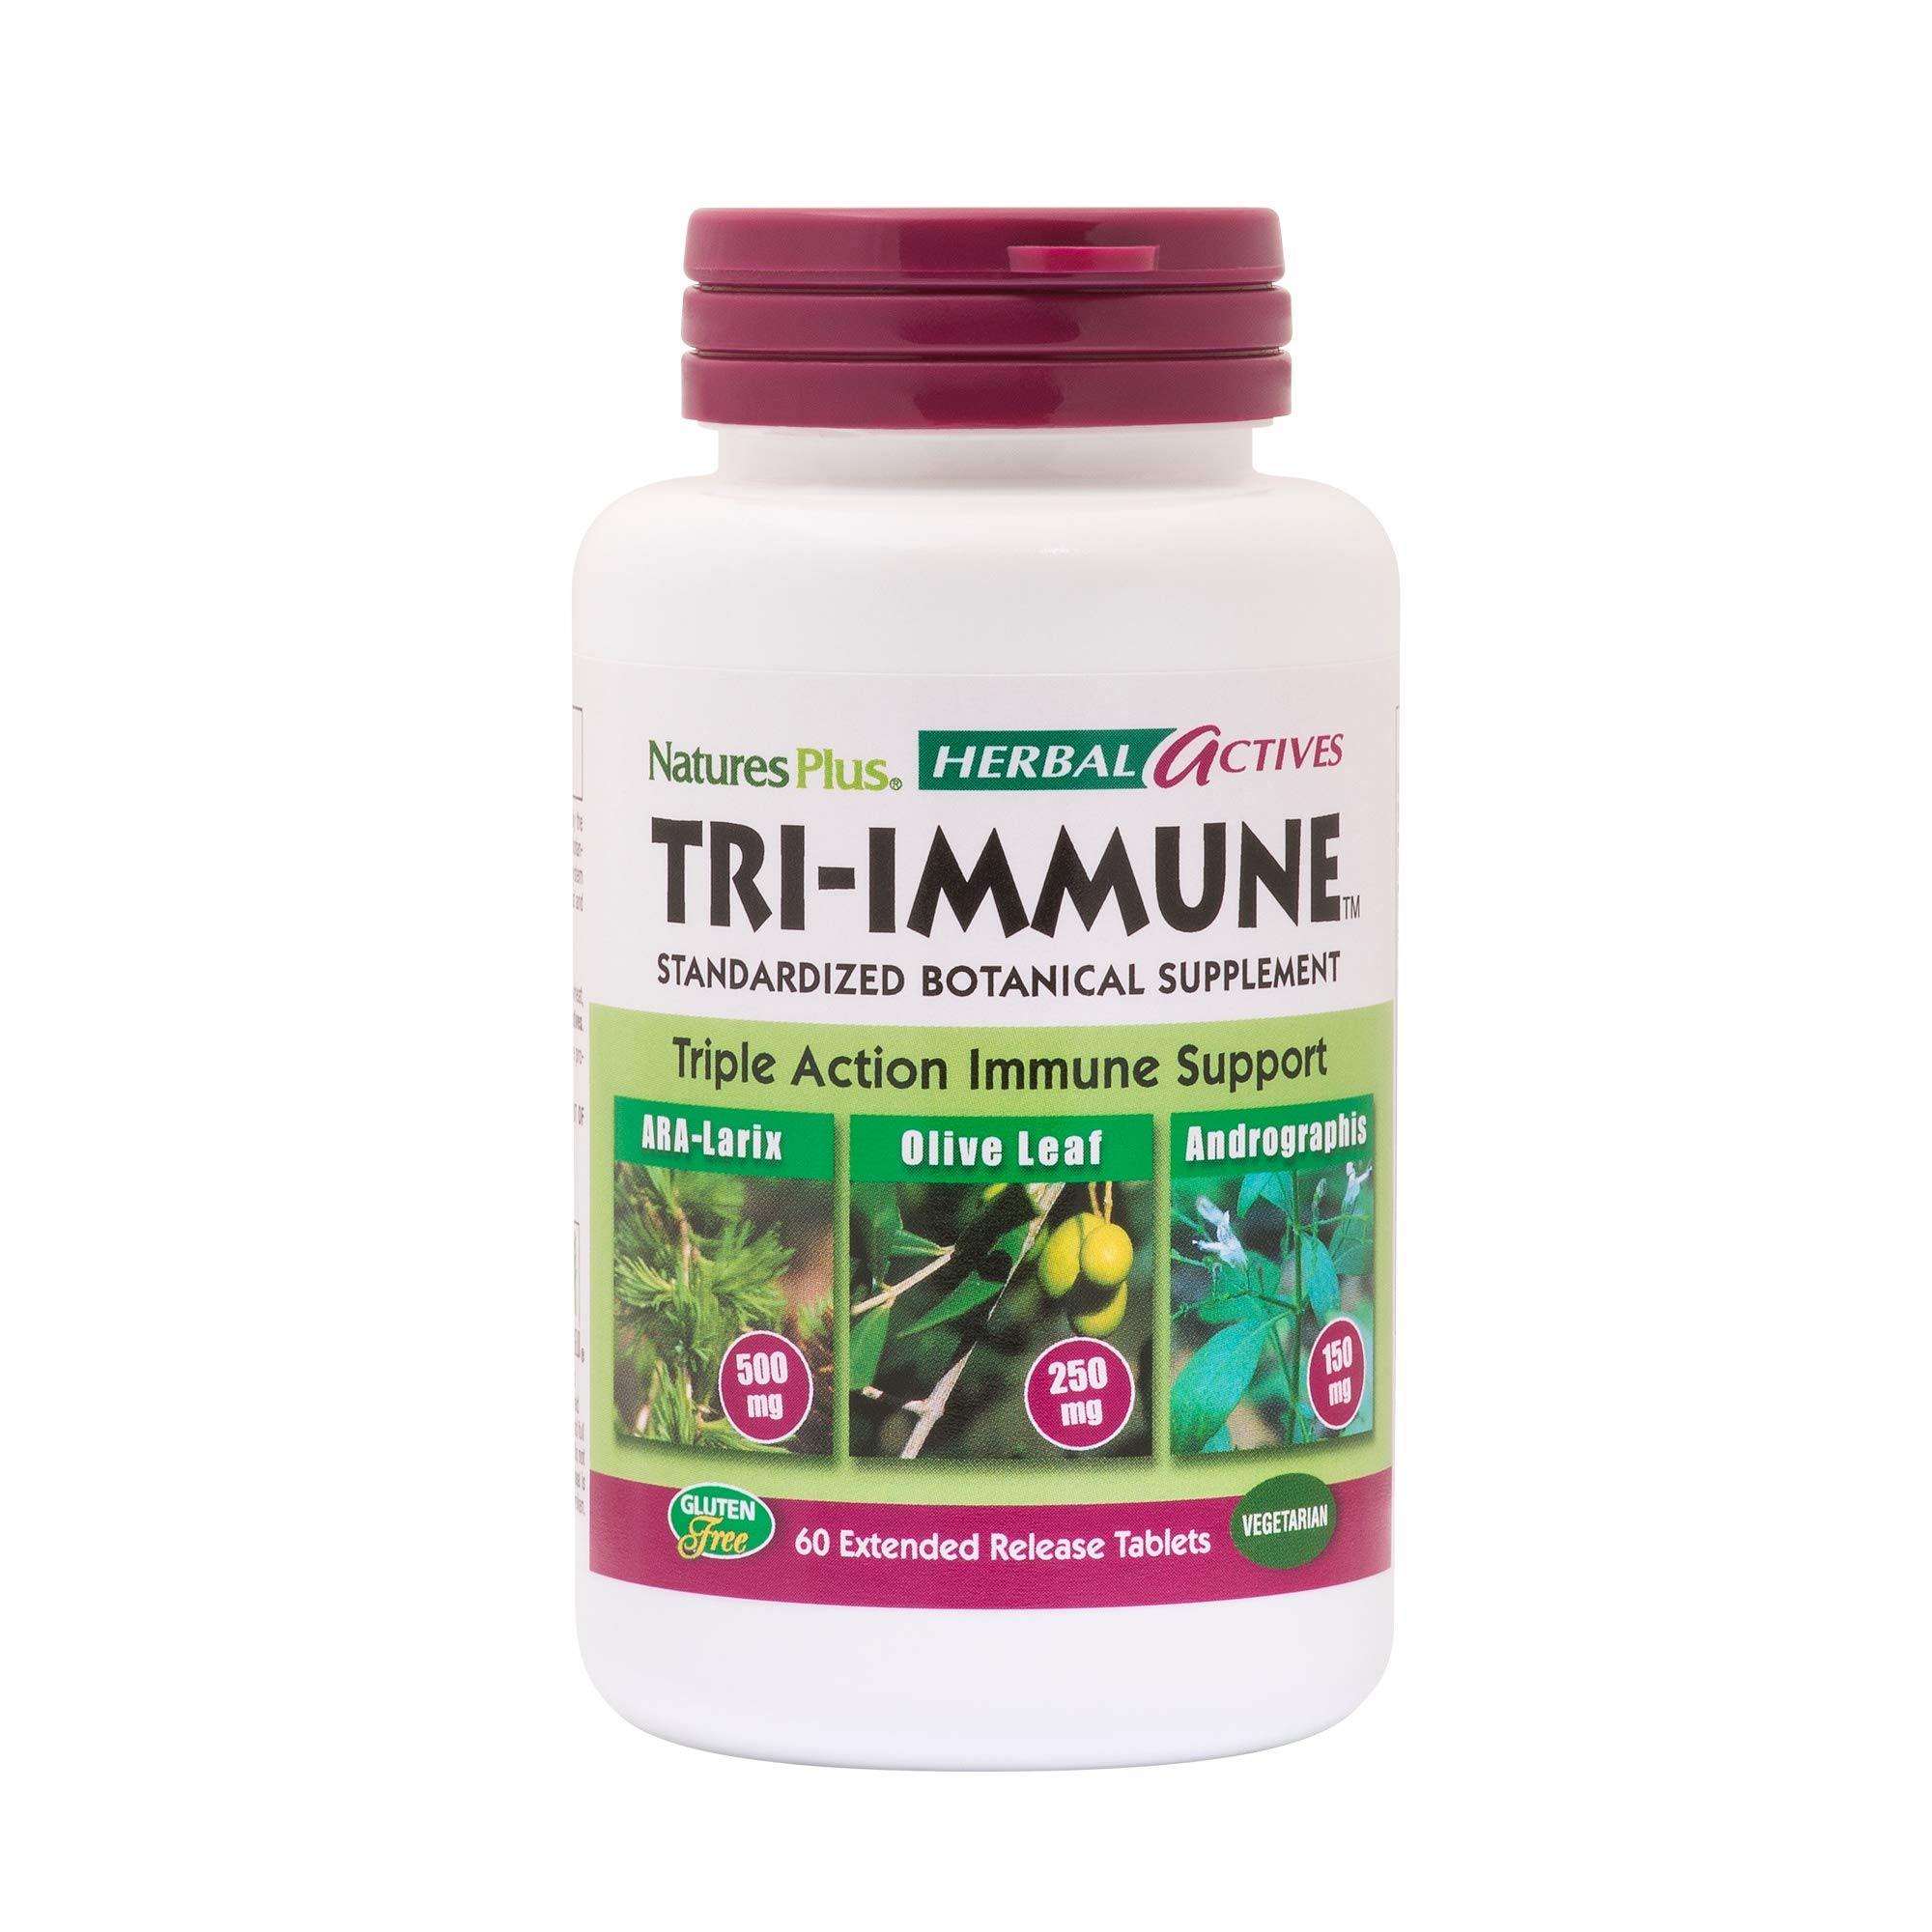 Natures Plus Herbal Actives Tri Immune - 60 Vegan Tablets, Extended Release - Olive Leaf, Arabinogalactans, Andrographis & Vitamin C Supplement - Vegetarian, Gluten Free - 30 Servings